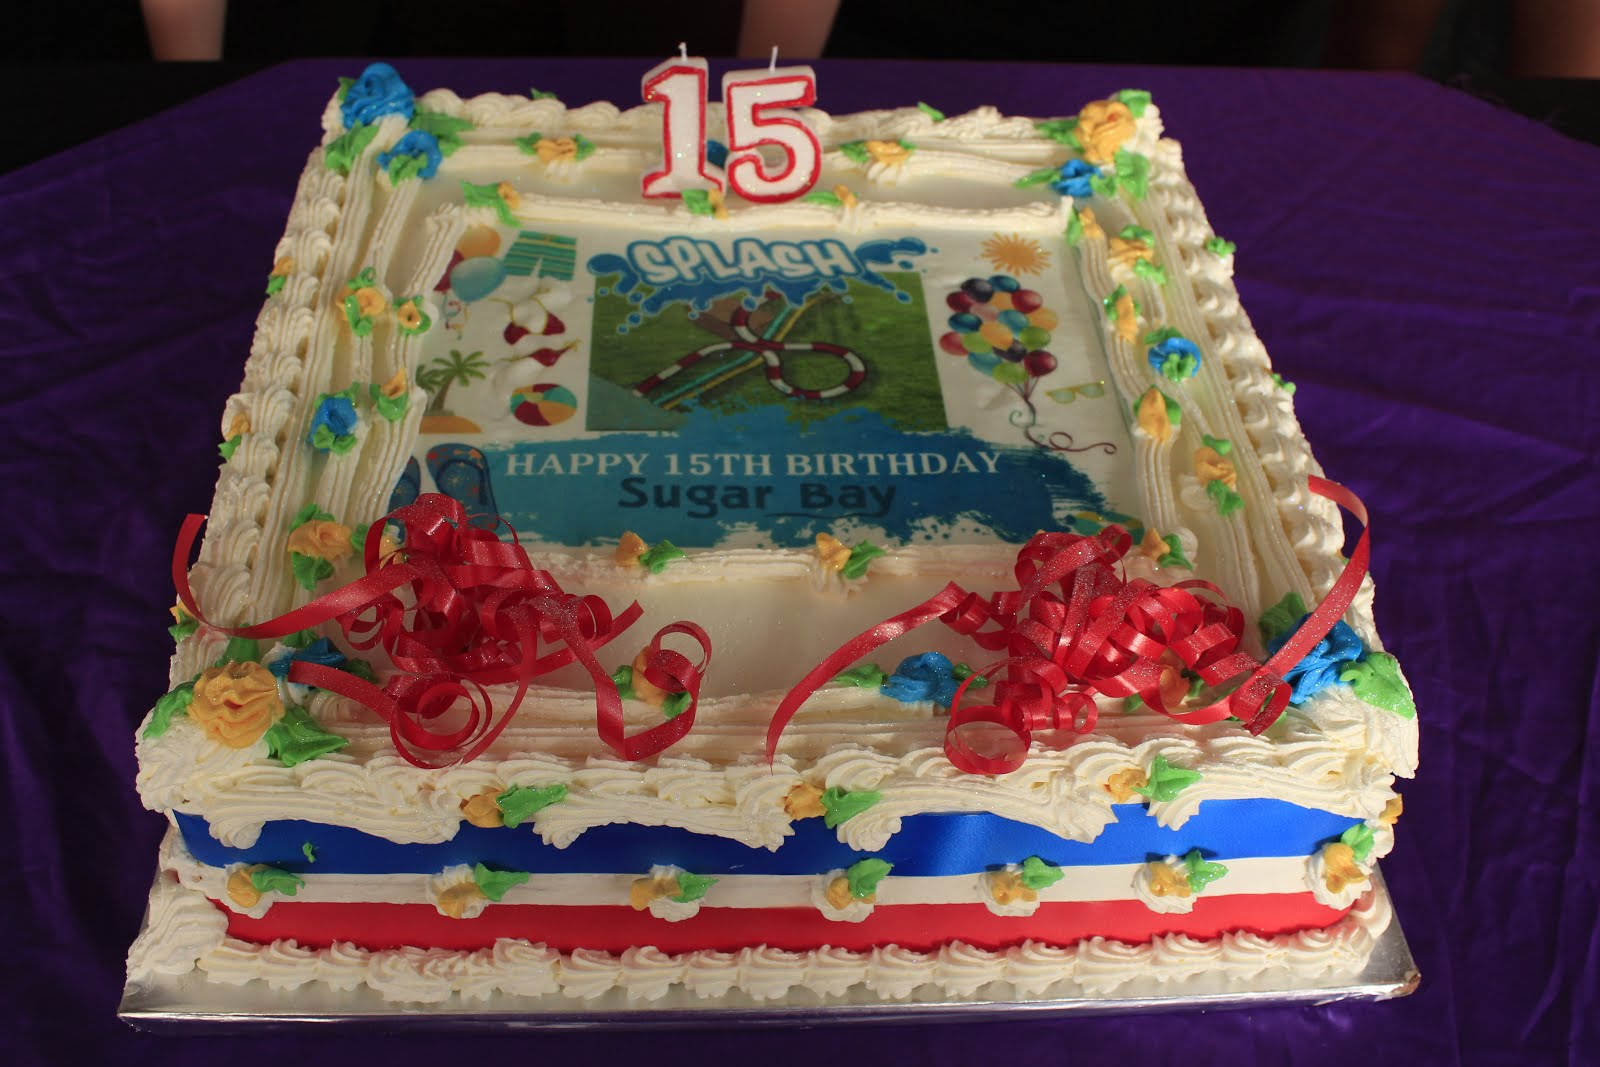 Life at the bay Sugar Bay celebrates 15th Birthday in style